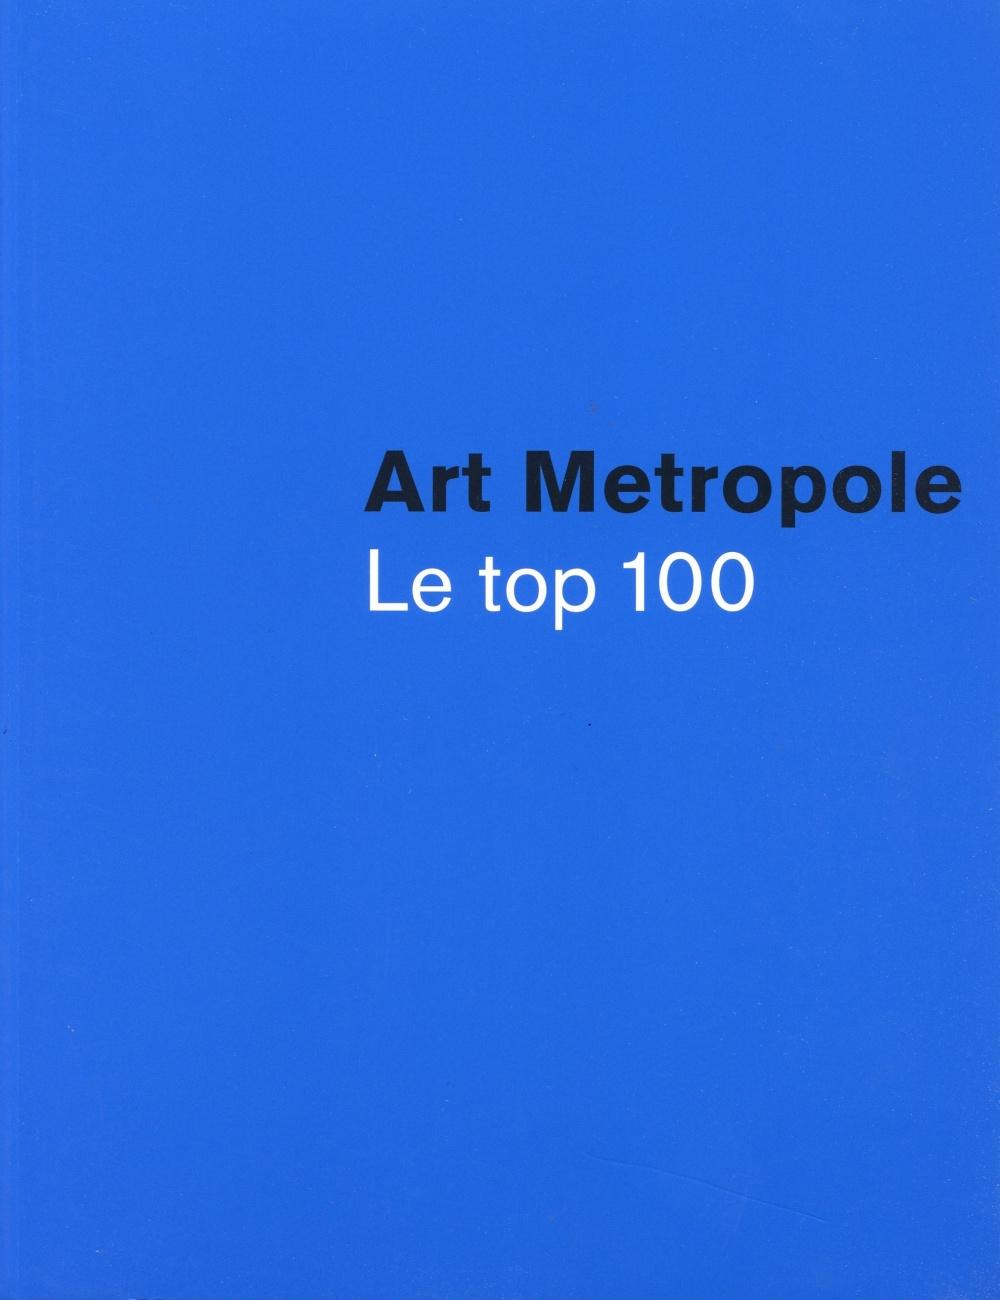 Le top 100